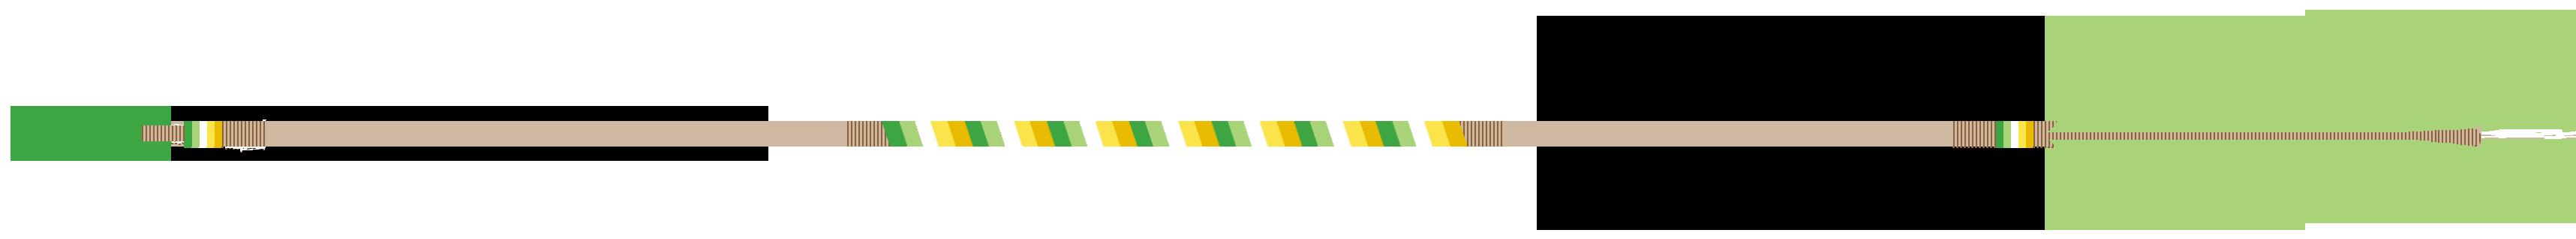 Arrow Divider - AlloAro 1, Left